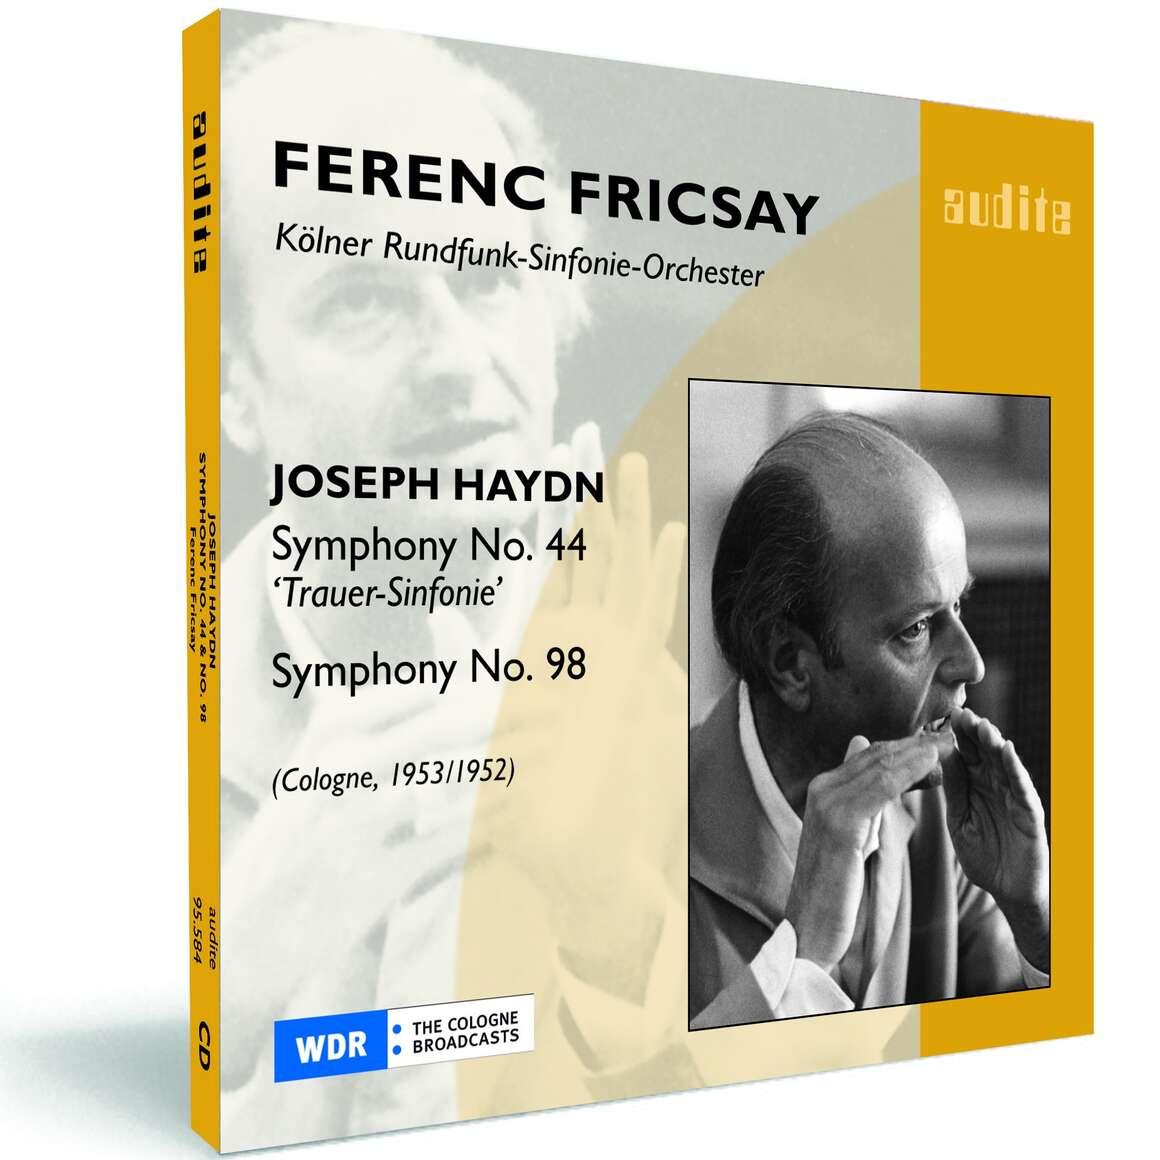 J. Haydn: Symphony No. 44 & No. 98